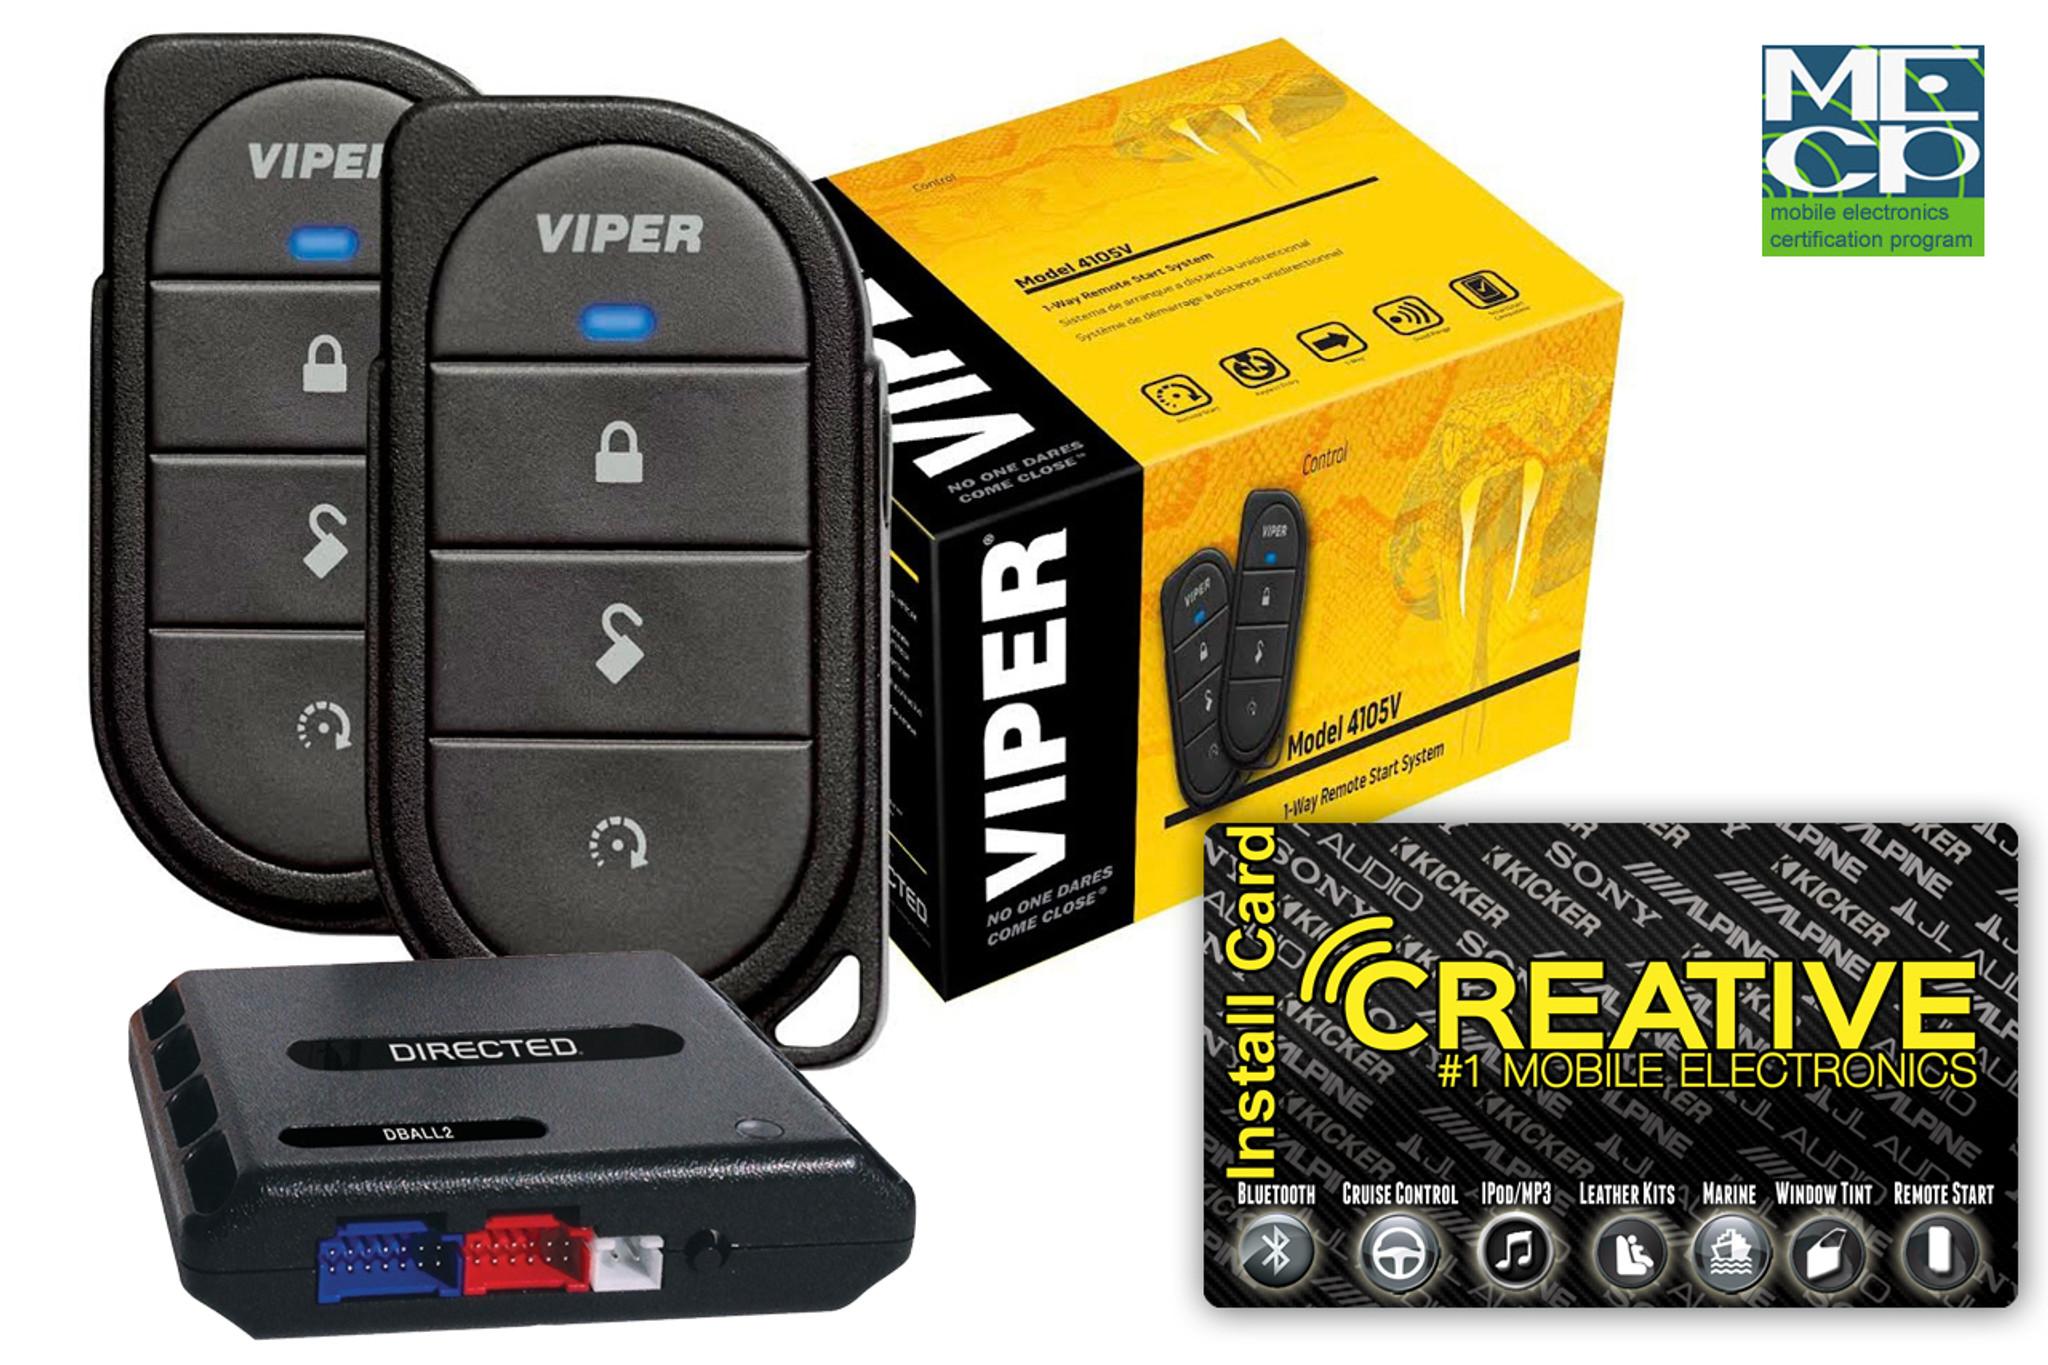 viper 1002 wiring diagram wiring diagrams lol viper auto start alarm viper 5704 wiring diagram [ 2048 x 1365 Pixel ]